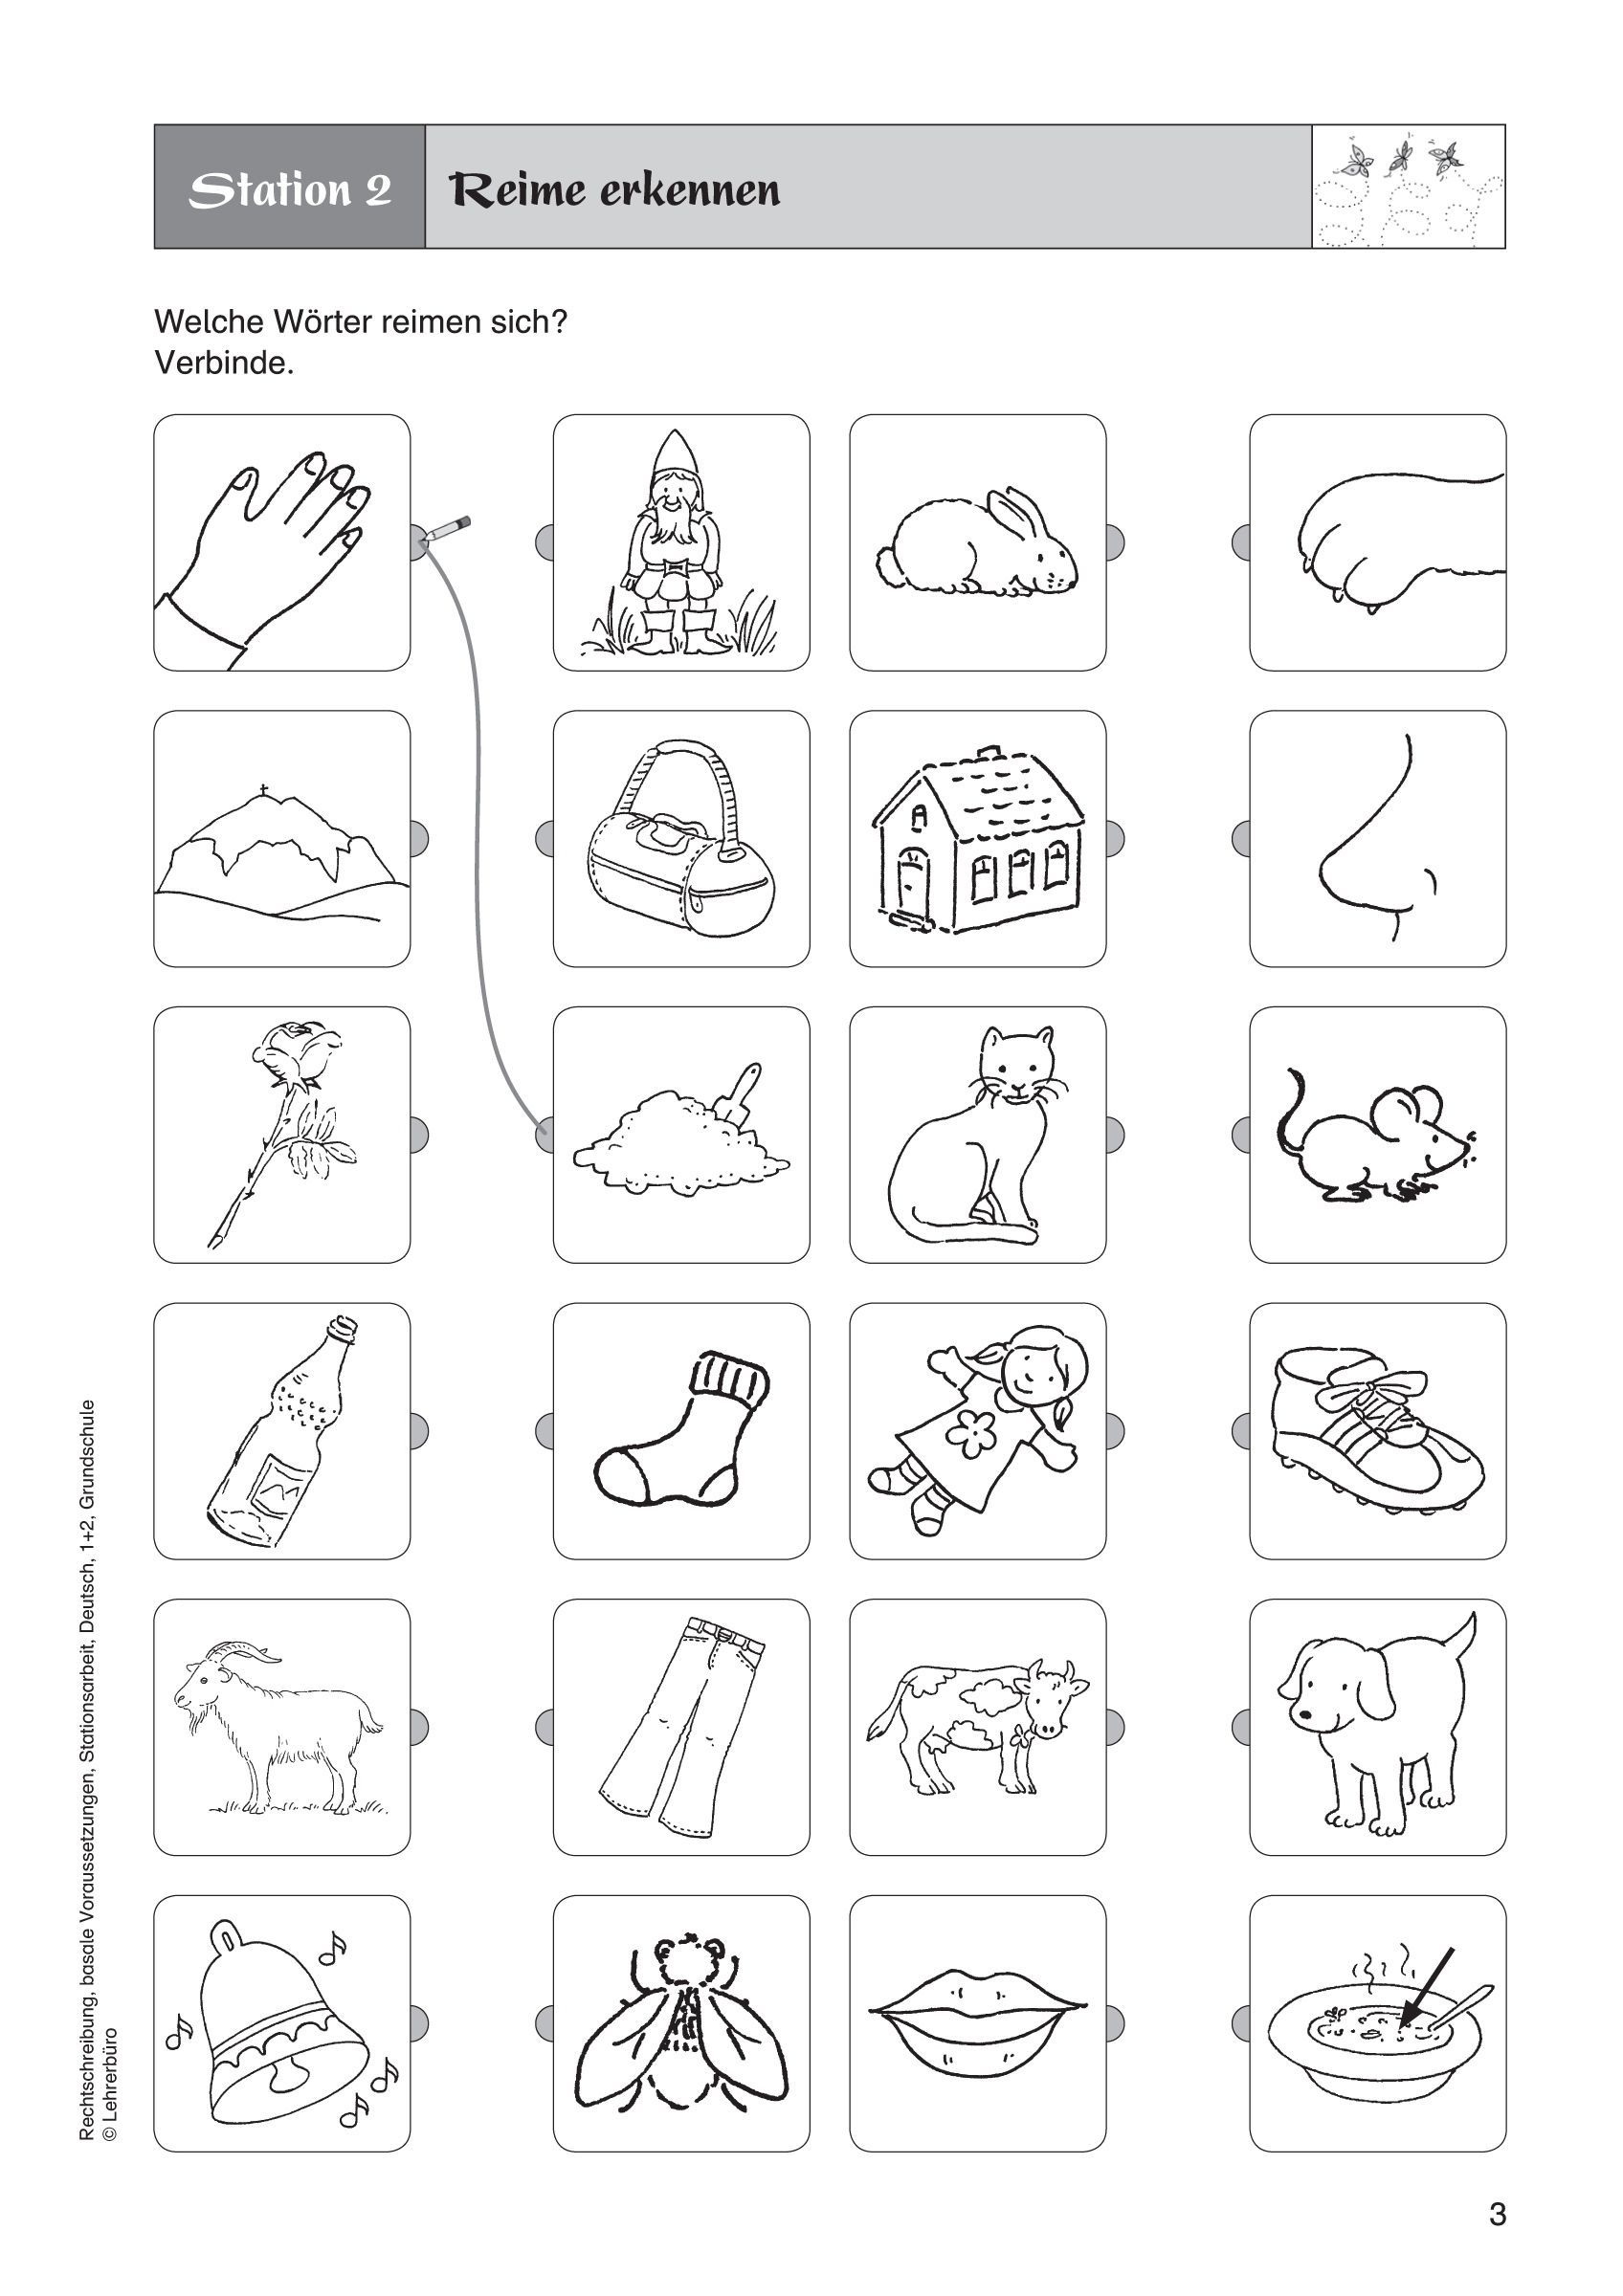 Arbeitsblätter Grundschule 1 Klasse Ausdrucken 1 Klasse für Arbeitsblätter Für Vorschulkinder Zum Ausdrucken